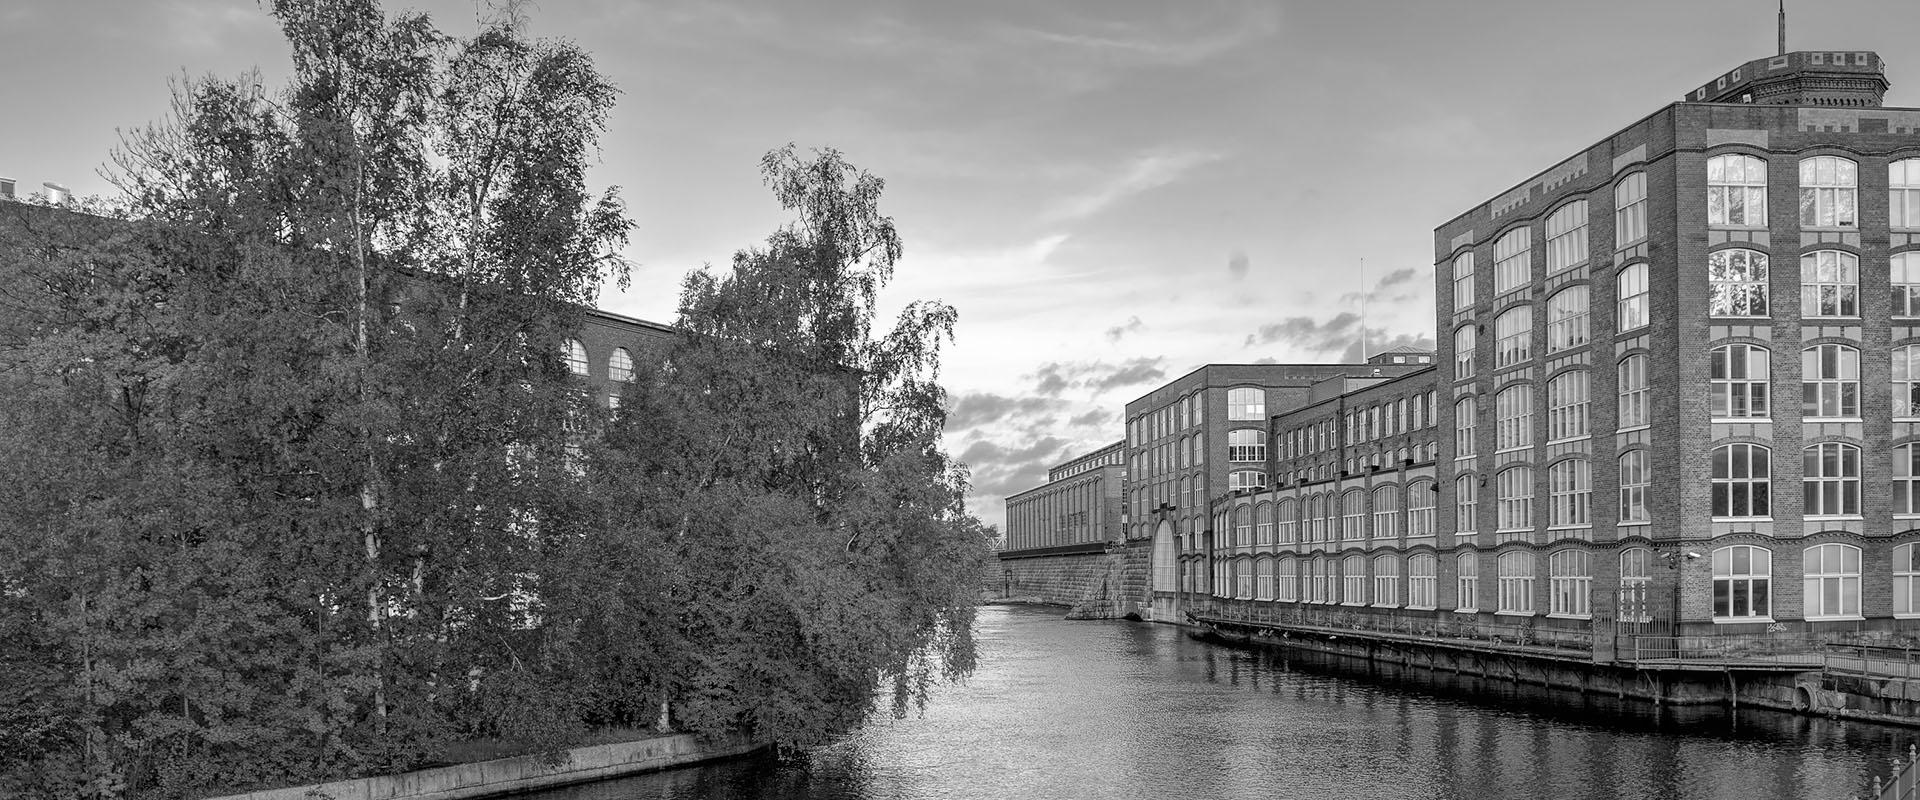 Kiinteistönvälitys Bo LKV - Tampere